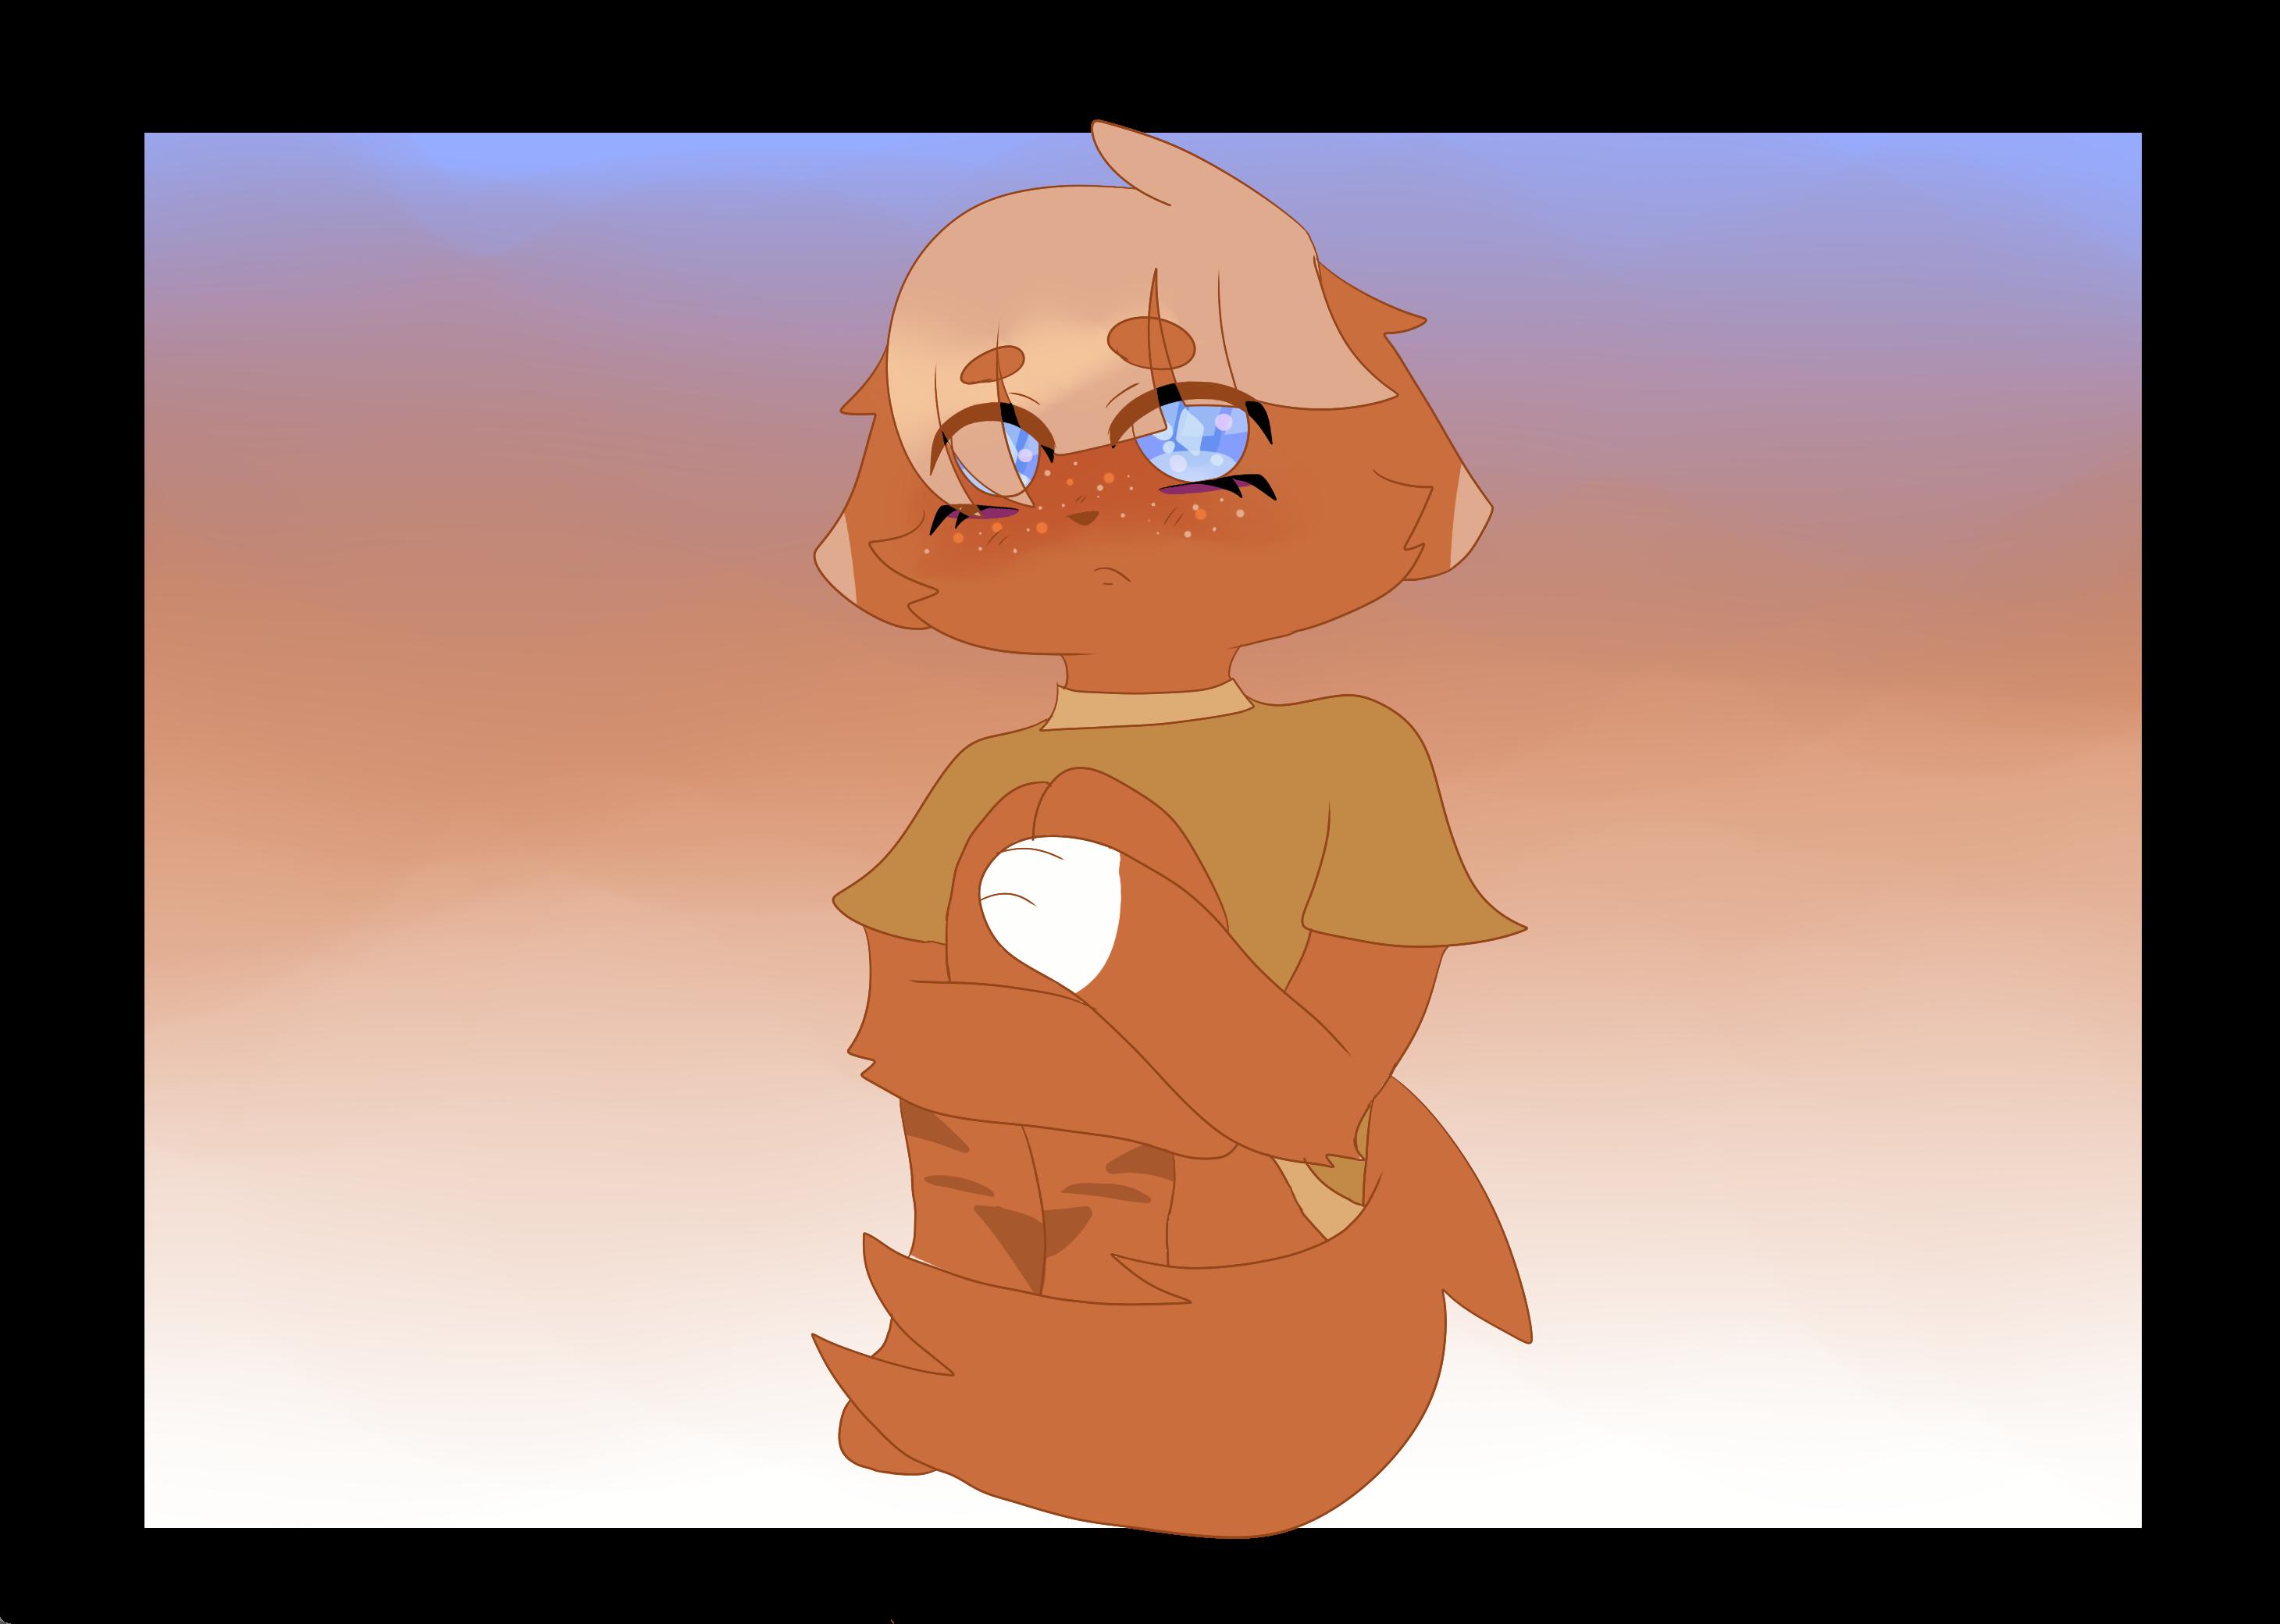 fuvking depressed